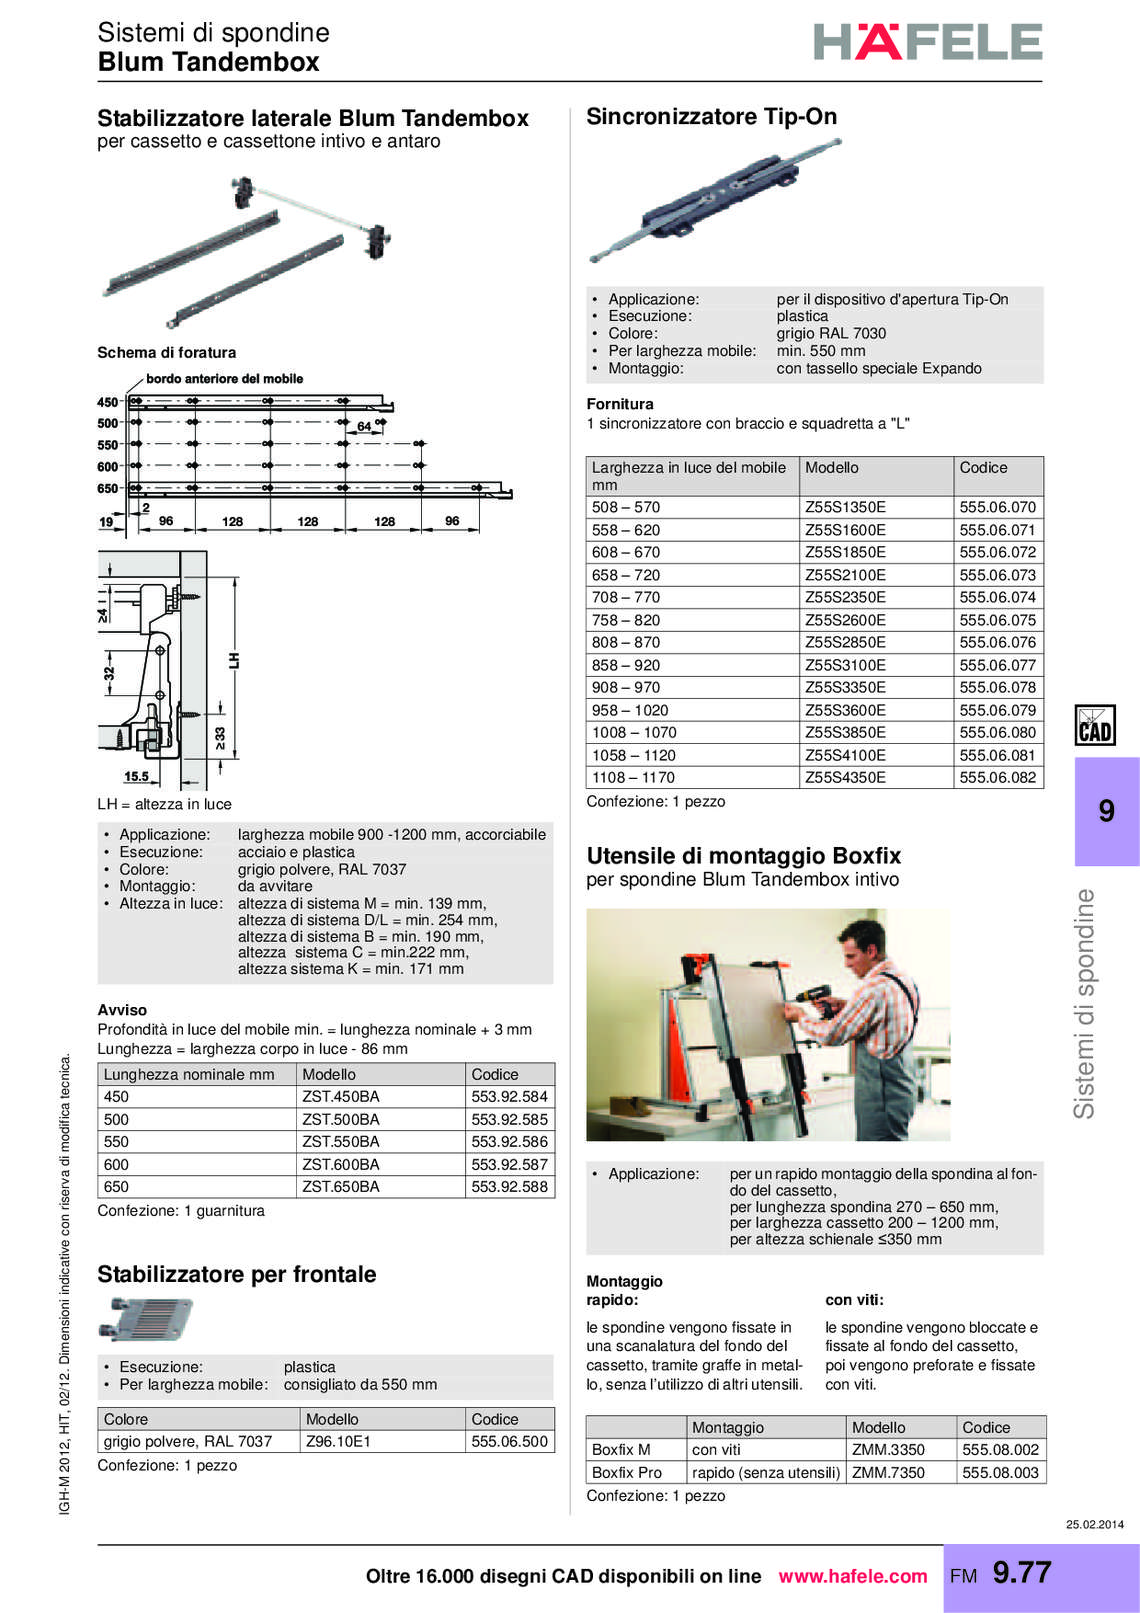 hafele-spondine-e-guide-per-mobili_40_100.jpg